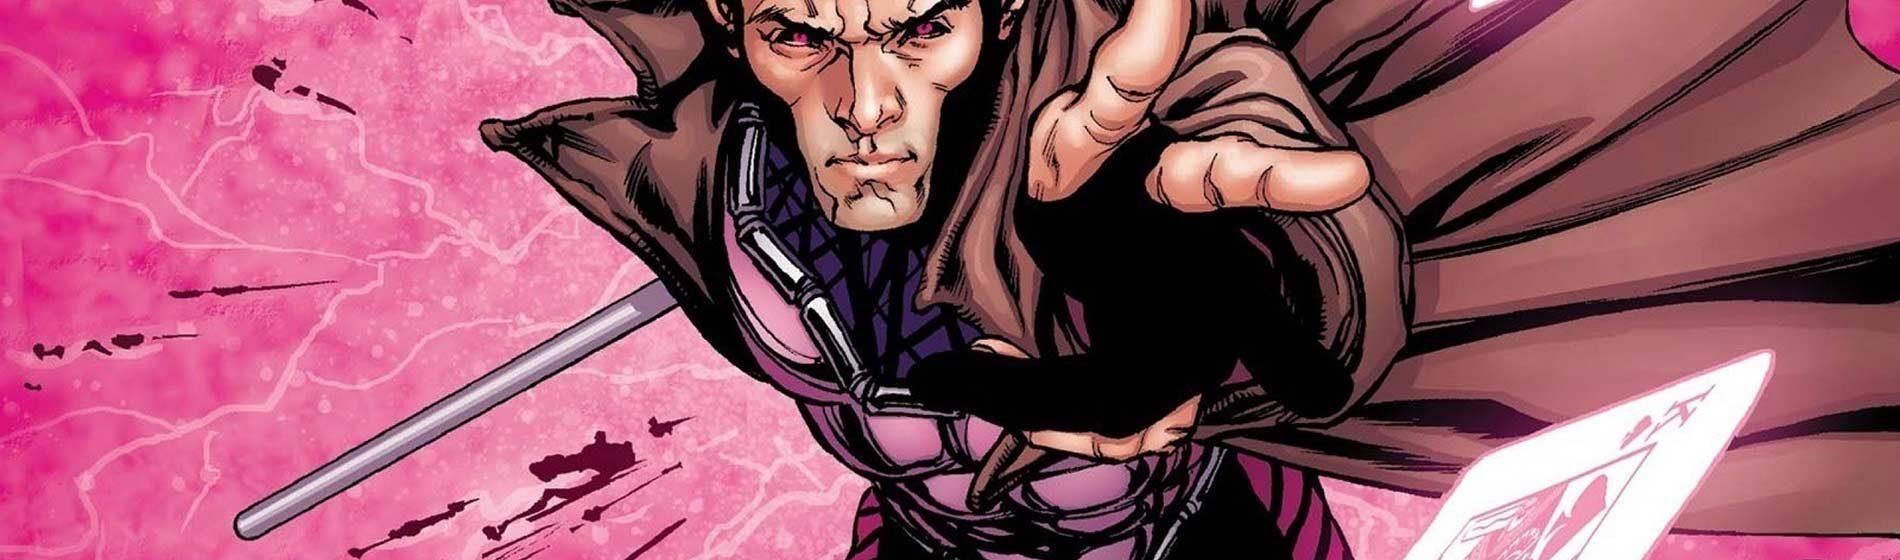 Gambit Channing Tatum